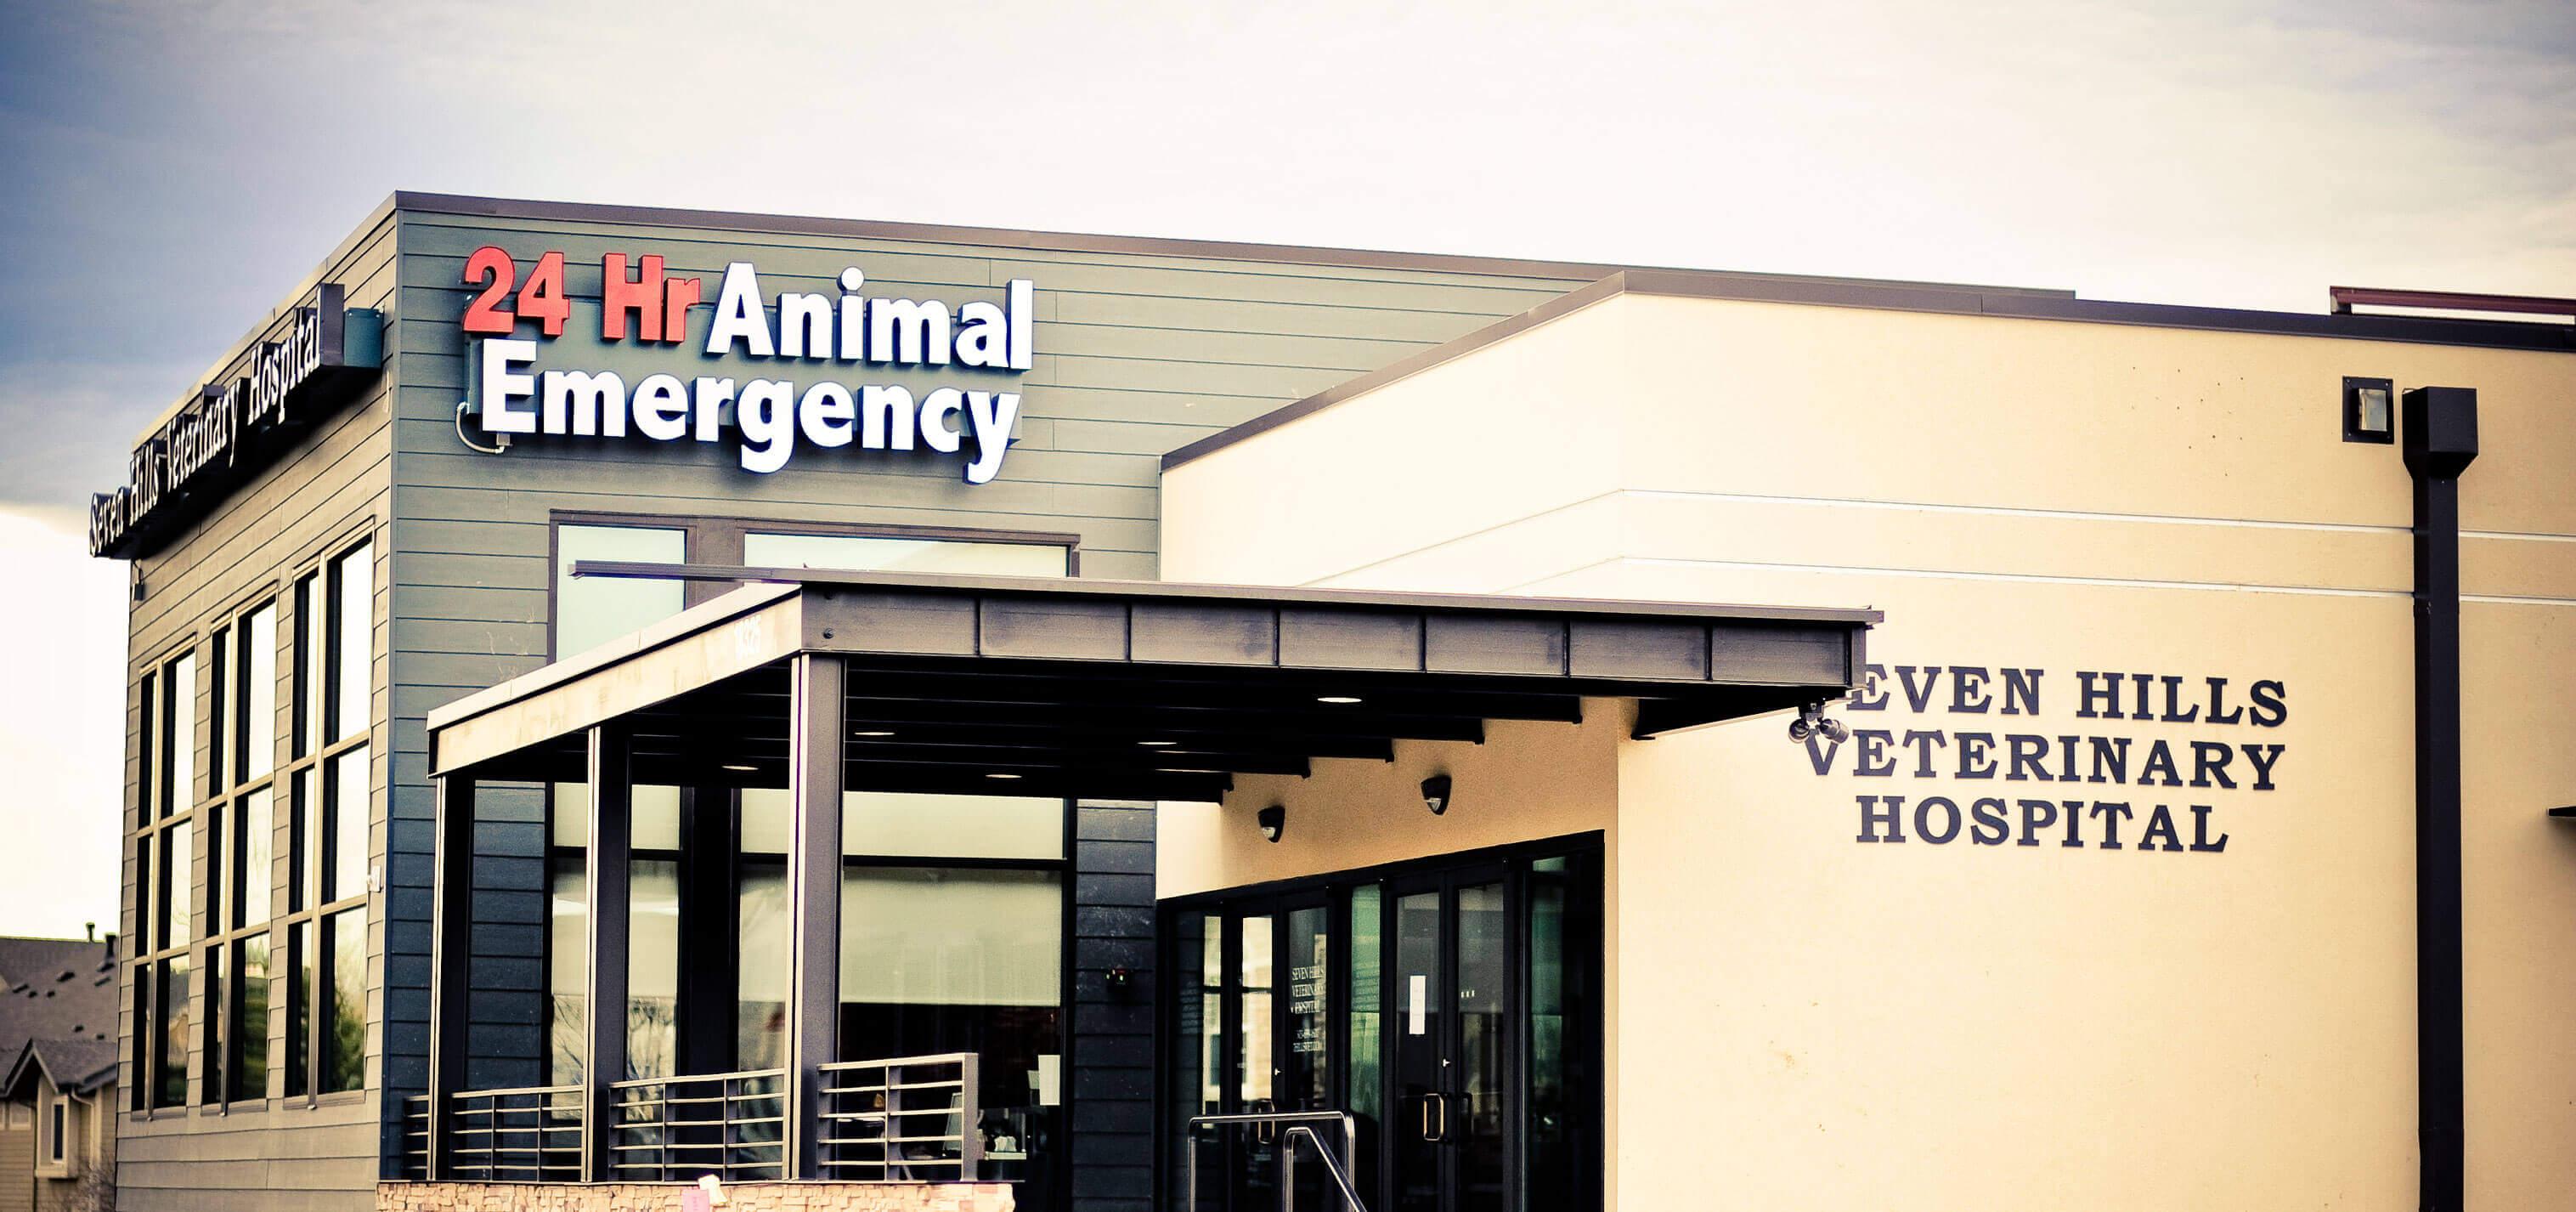 Top Rated Local Veterinarians – Seven Hills Veterinary